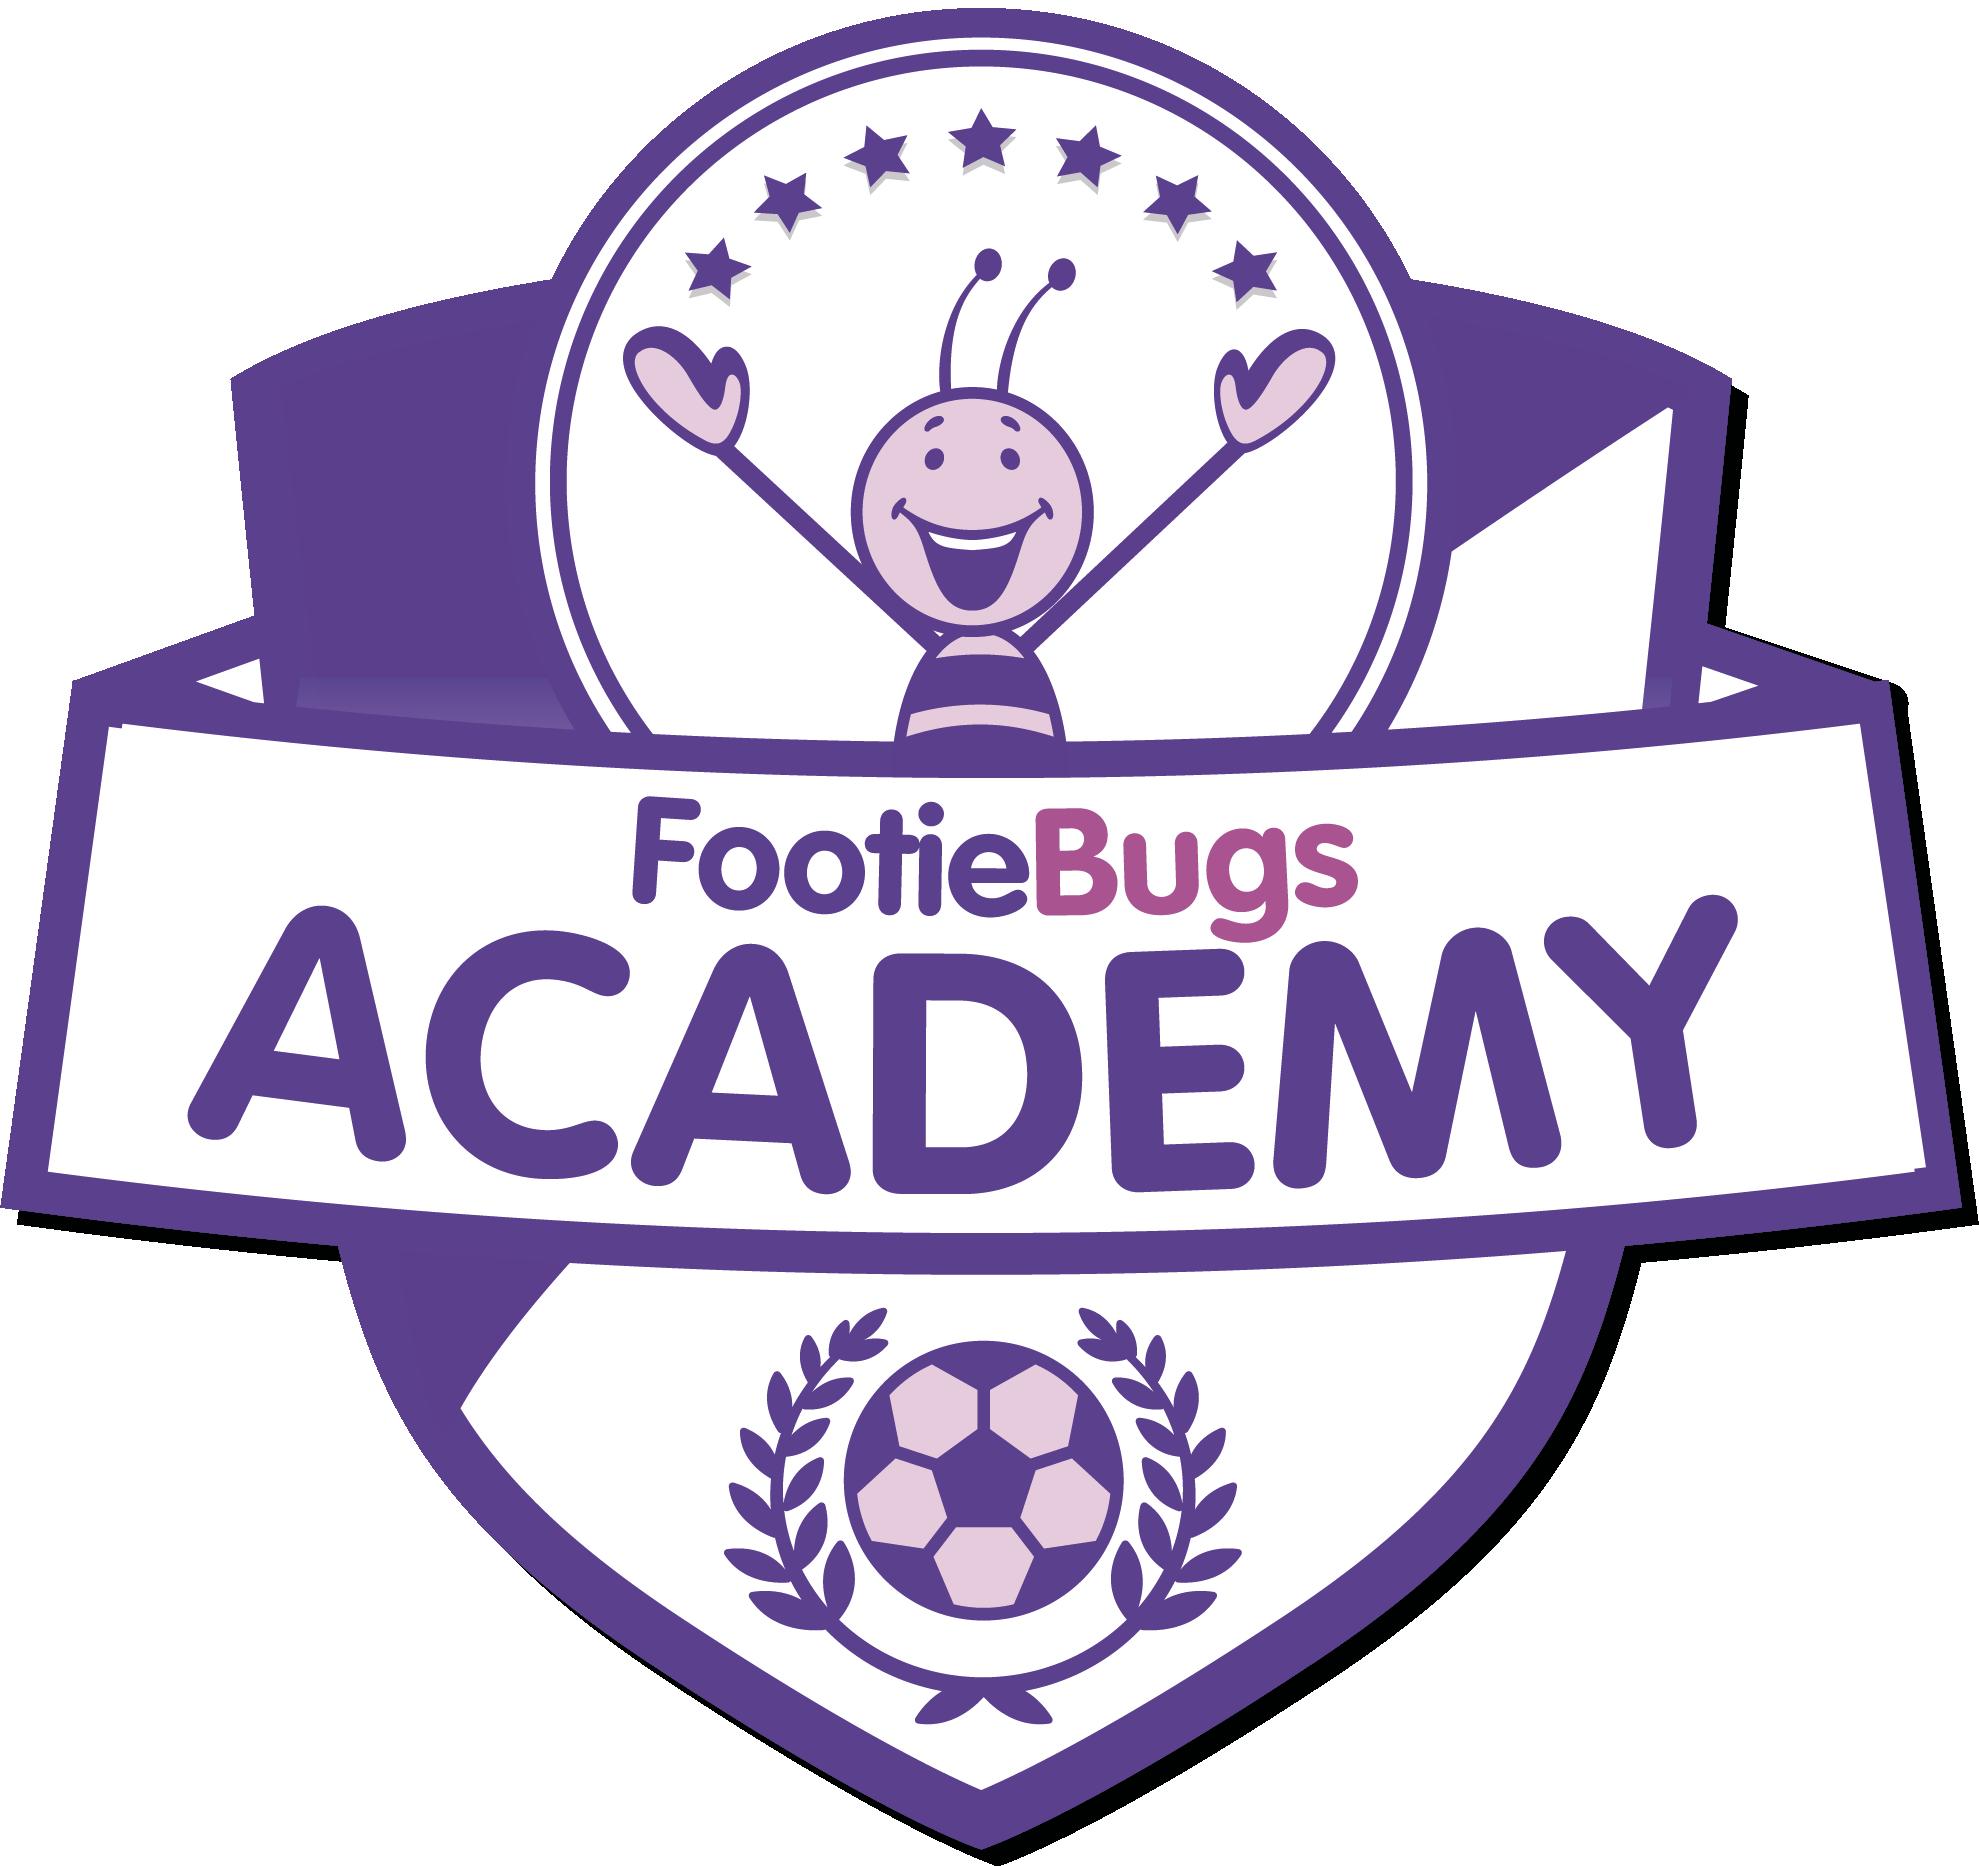 FootieBugs Children's Football Academy in Solihull